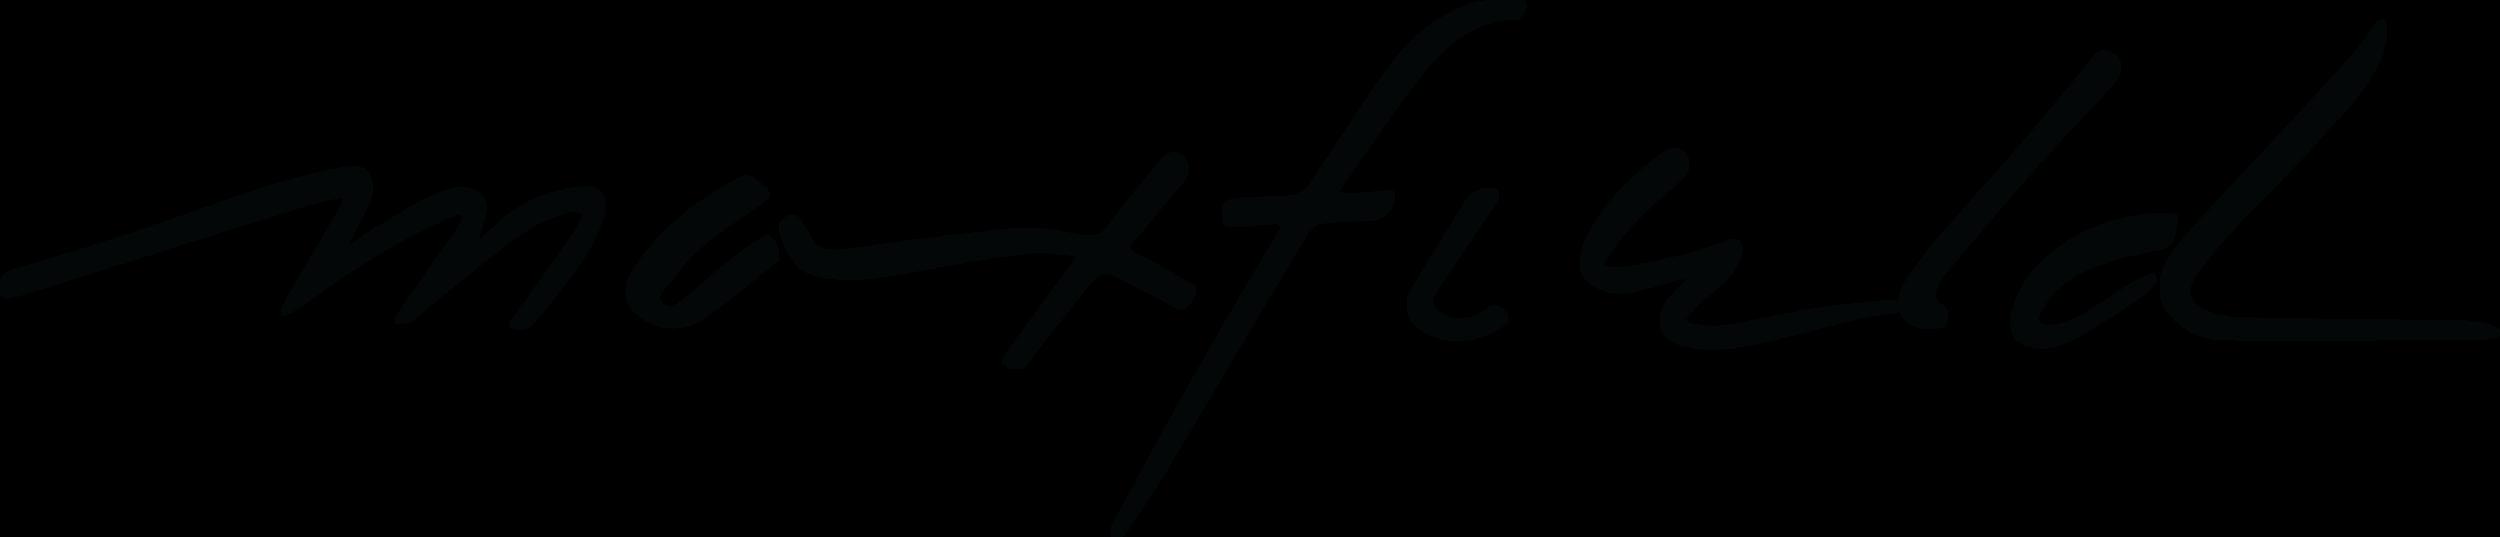 Maxfield Black Logo.png